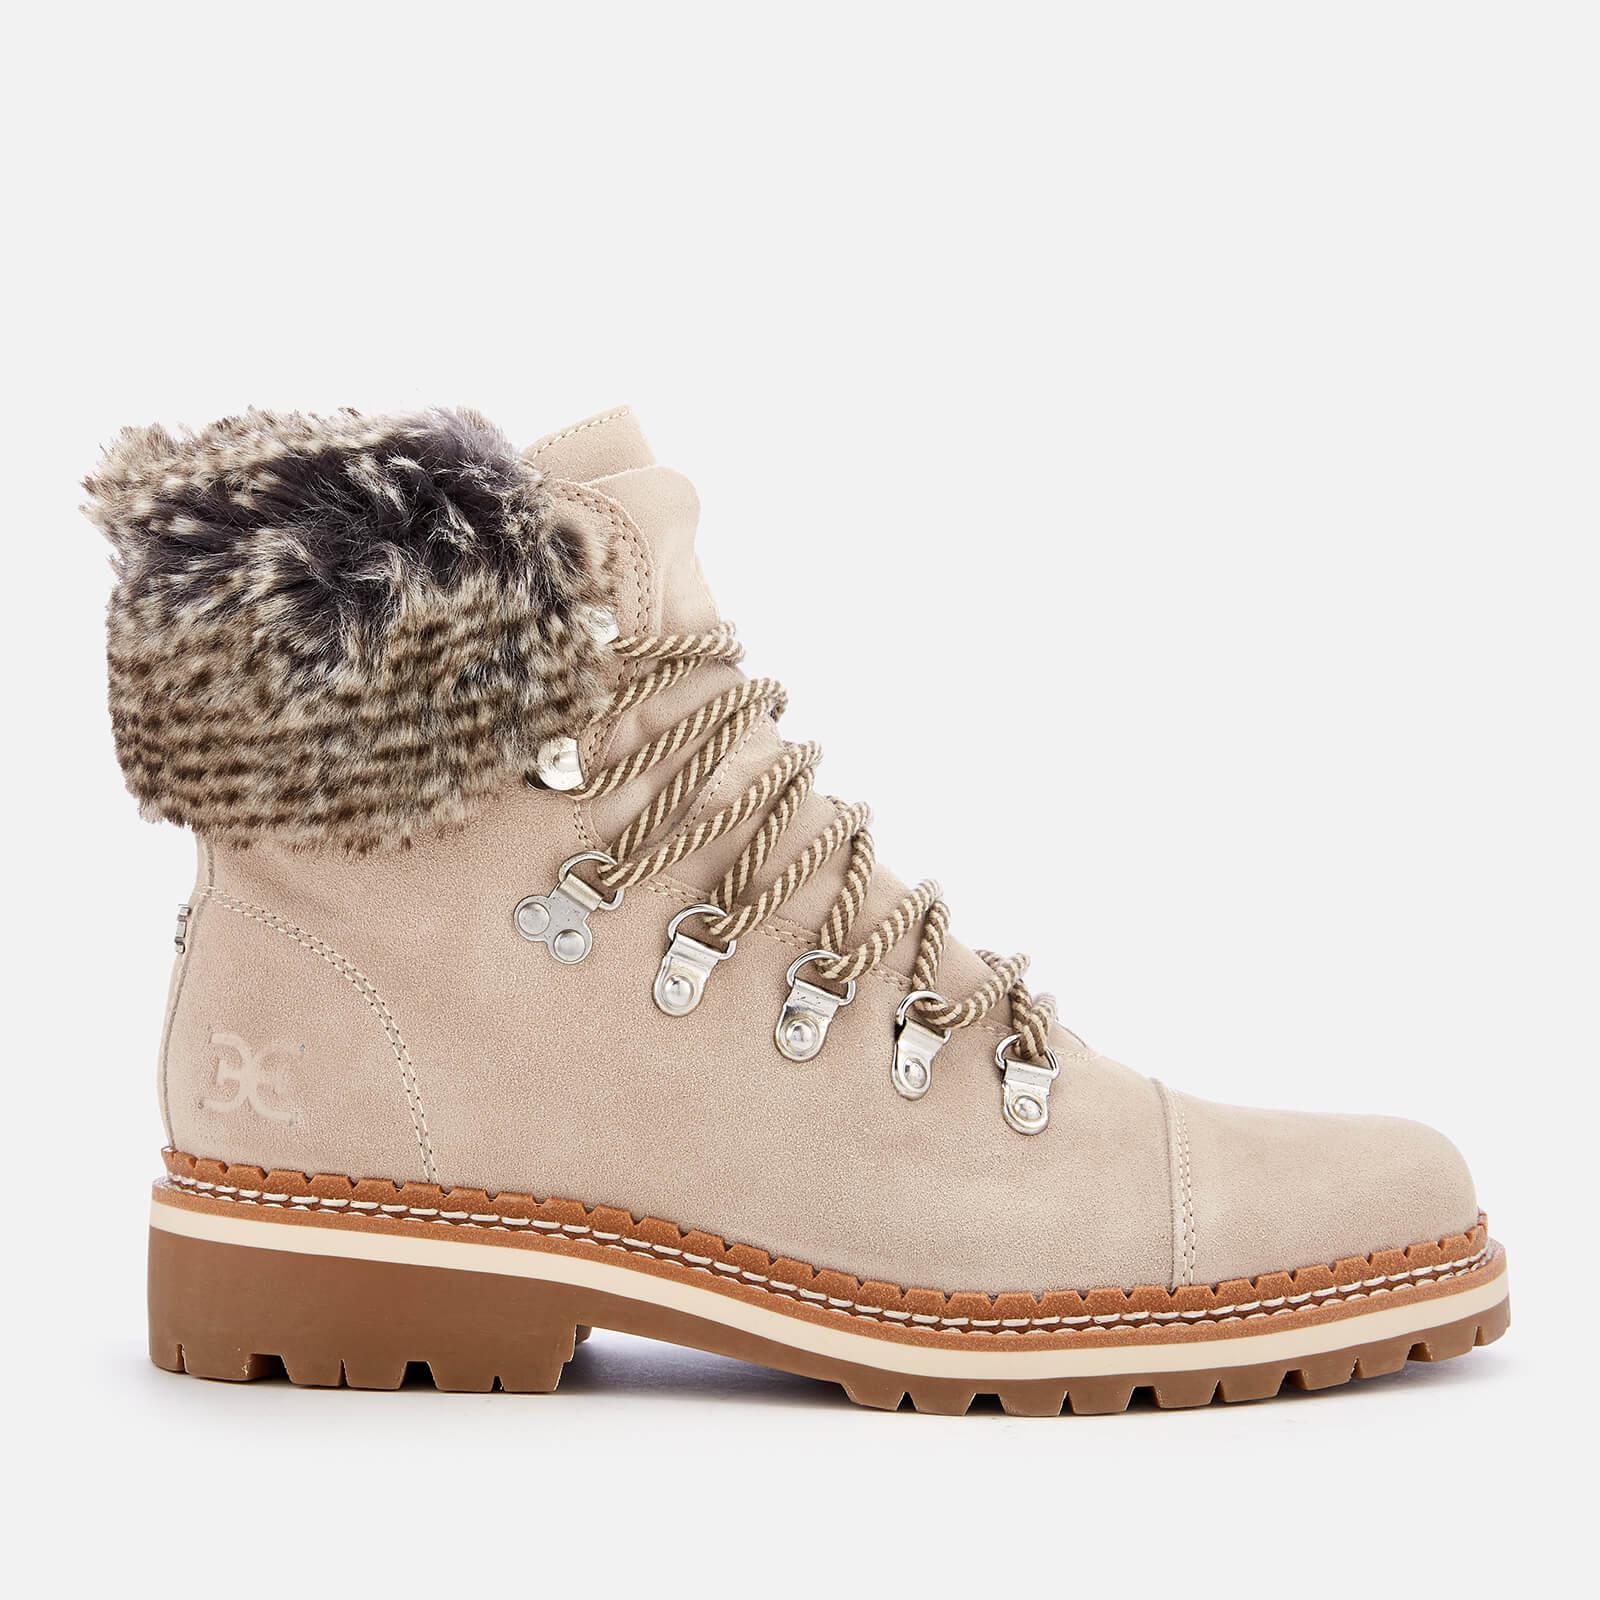 46497e5cd Sam Edelman - Gray Bowen Velutto Suede Hiker Style Boots - Lyst. View  fullscreen